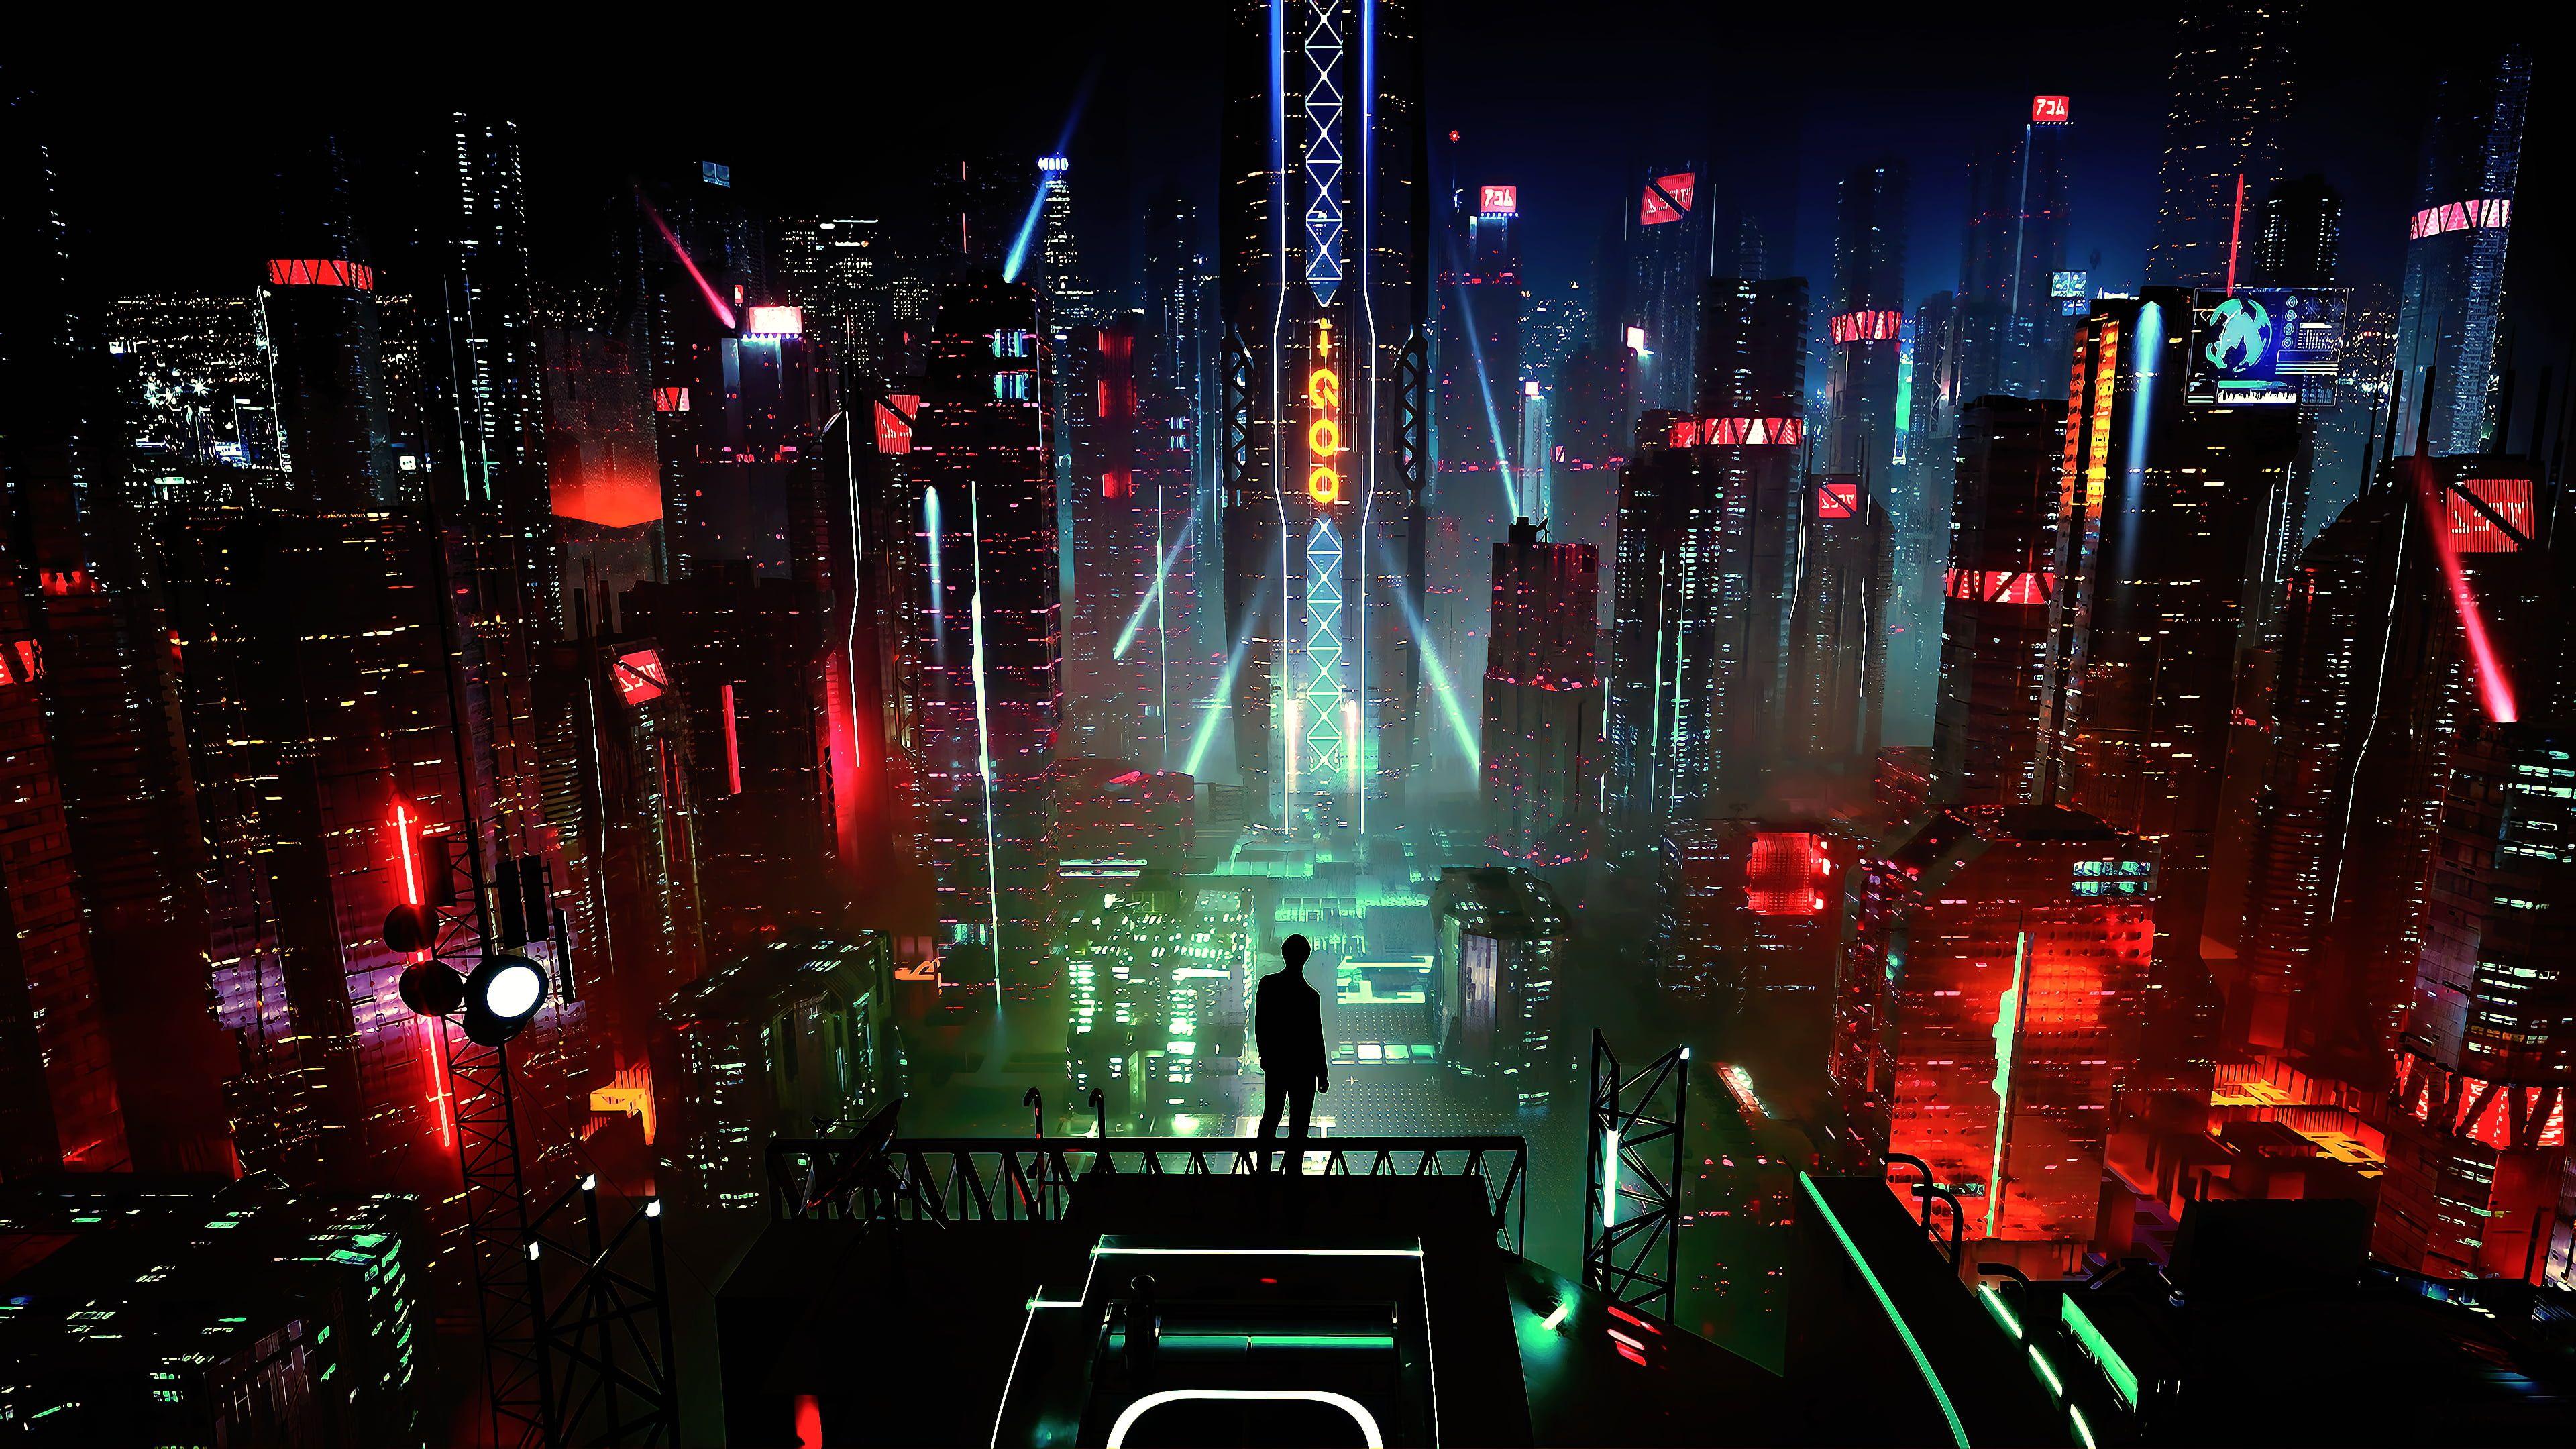 Cyber Science Fiction Digital Art Concept Art Cyberpunk Artwork Futuristic Fantasy Art Fan Art 3d Cityscape Futuristic In 2020 Concept Art Wallpaper Hd Wallpaper